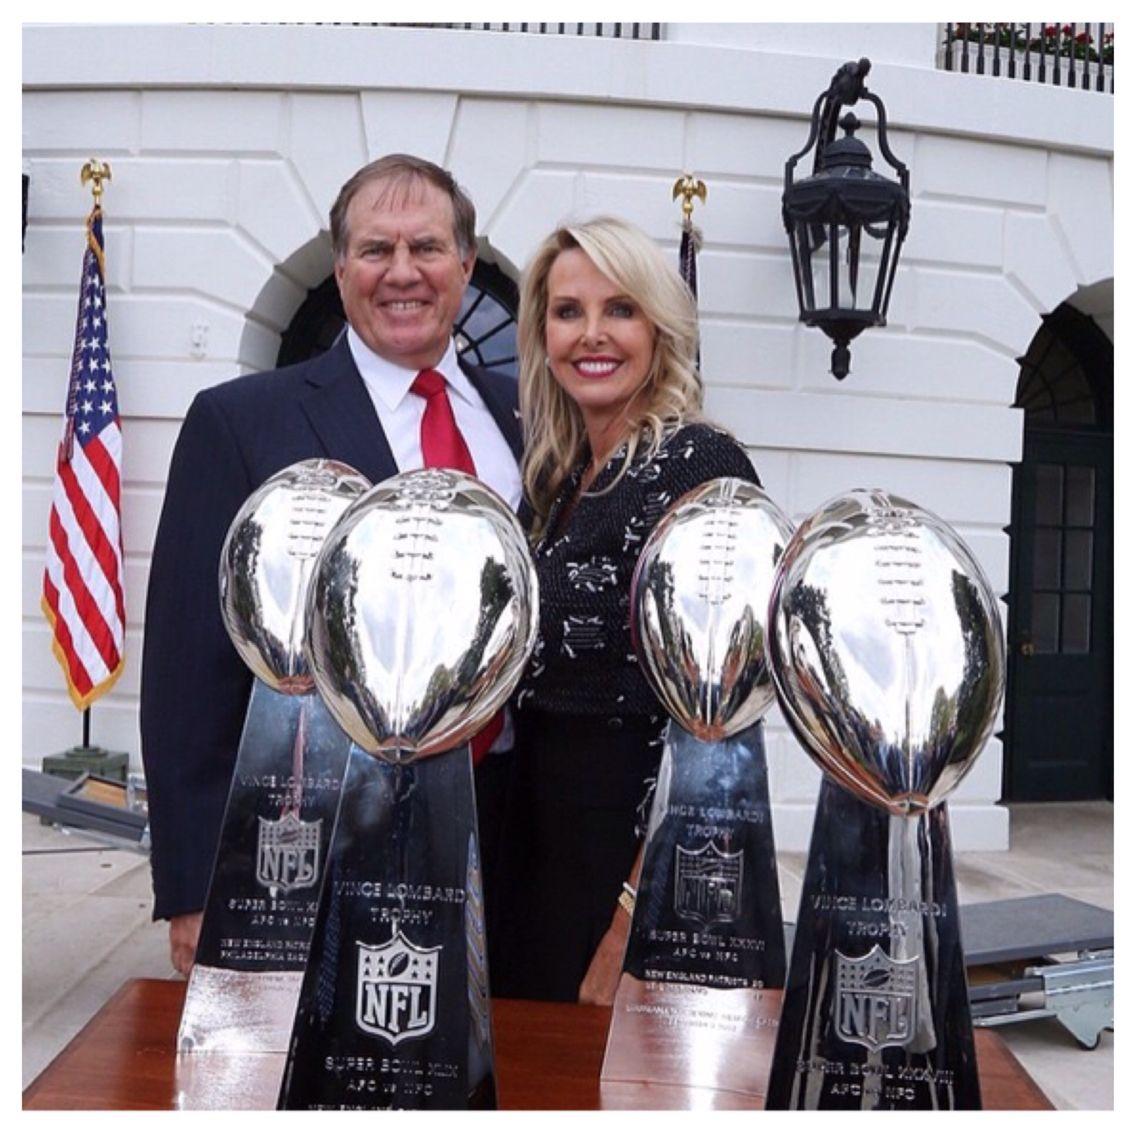 Linda And Bill Belichick Lombardi X S 4 01 03 04 14 New England Patriots Patriots Team Patriots Football